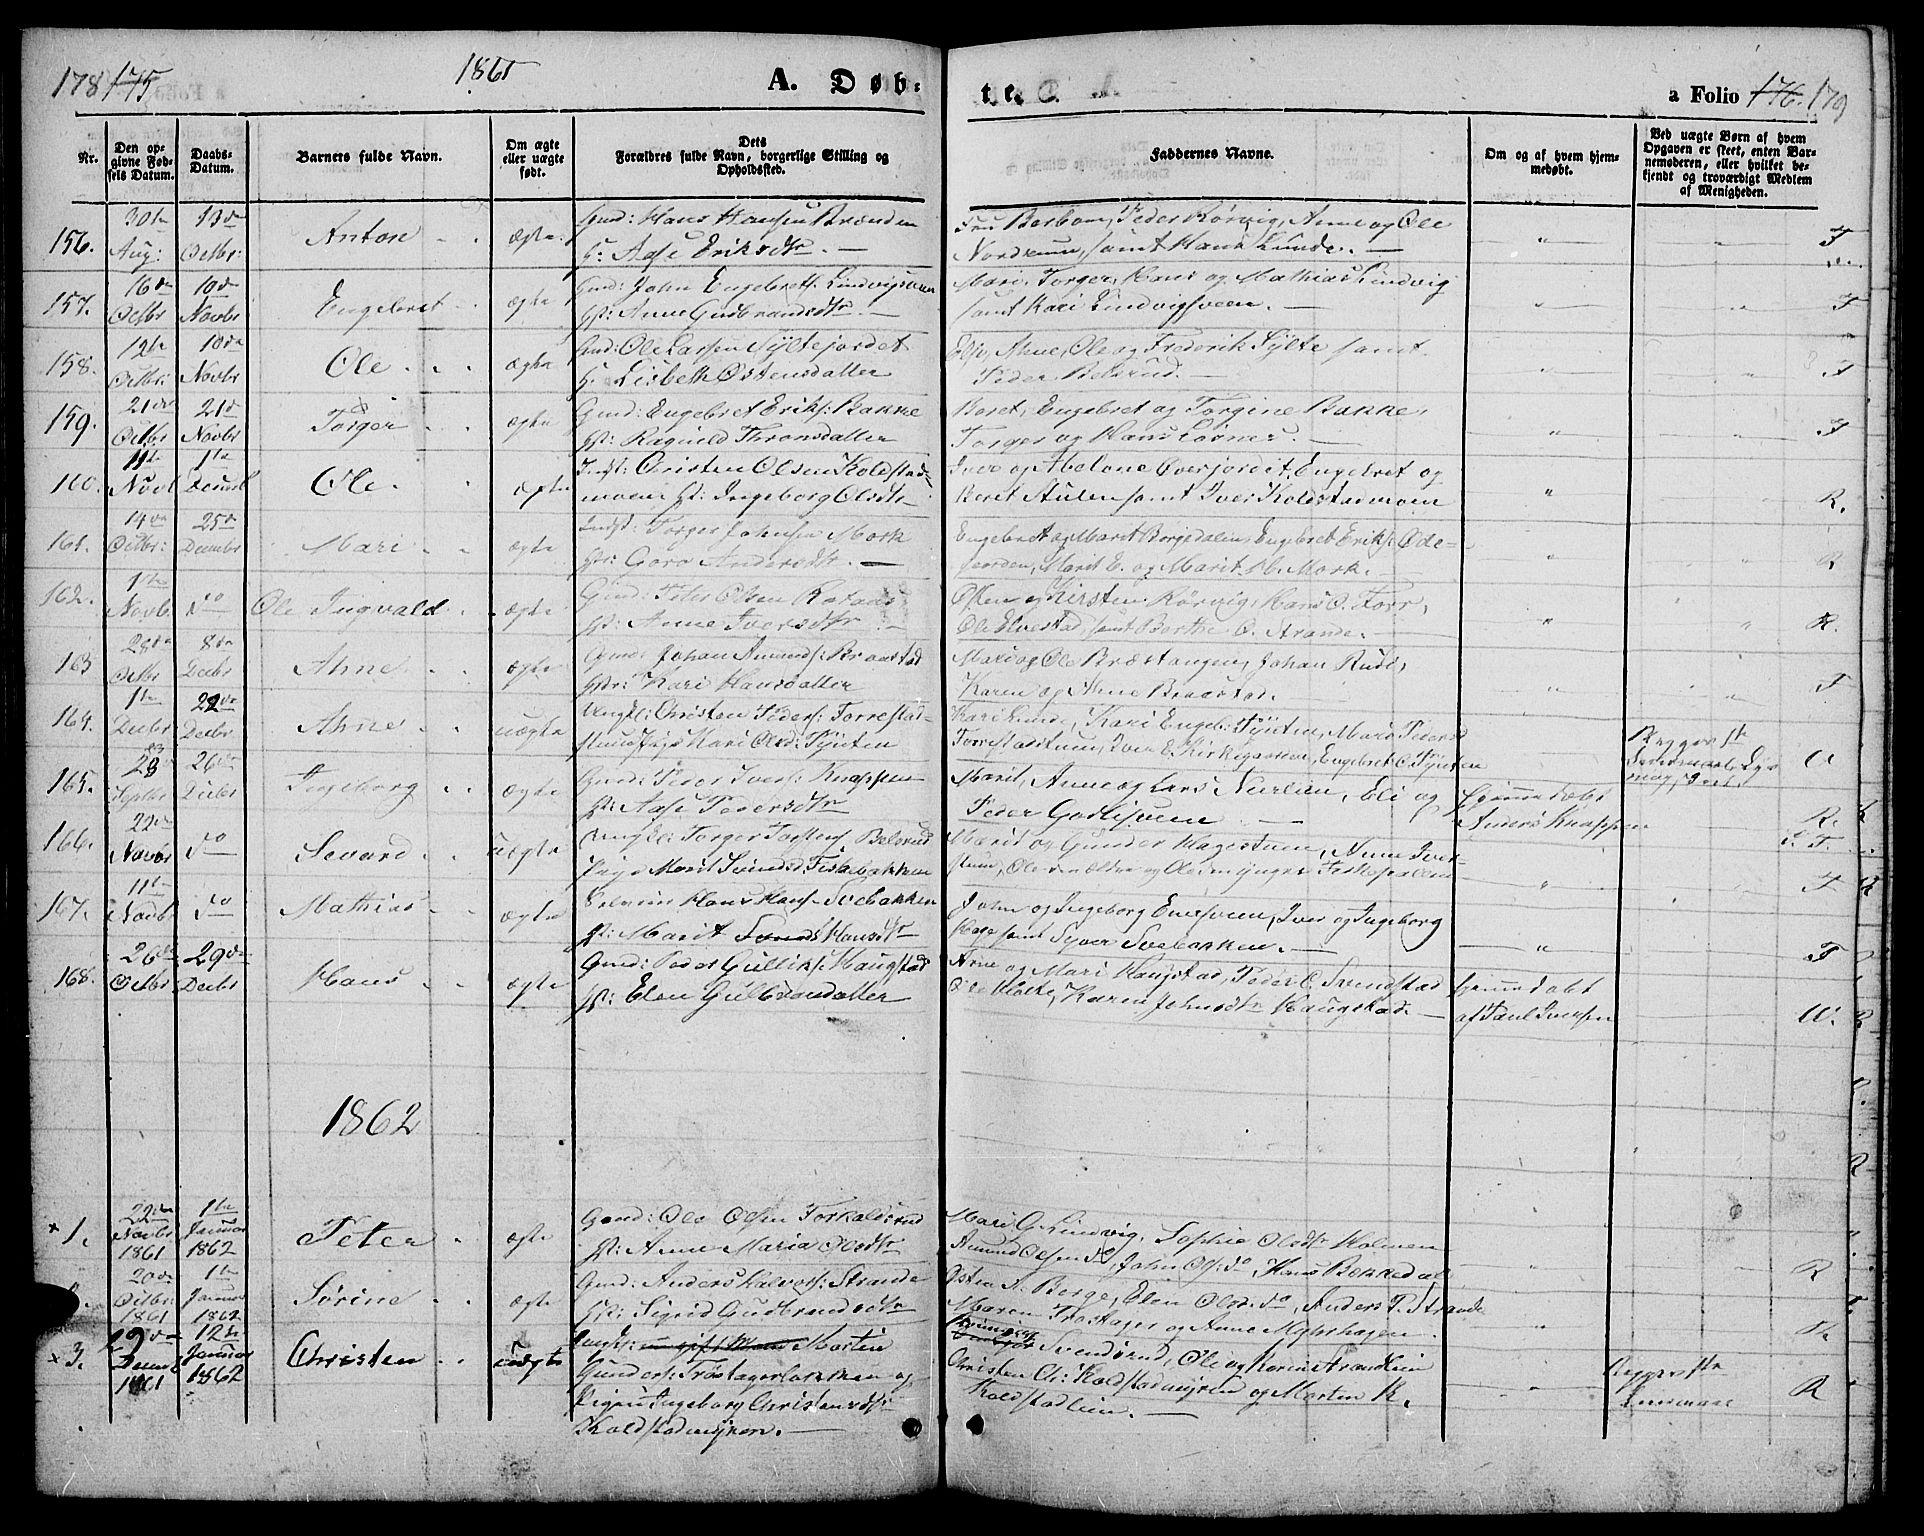 SAH, Ringebu prestekontor, Klokkerbok nr. 3, 1854-1866, s. 178-179